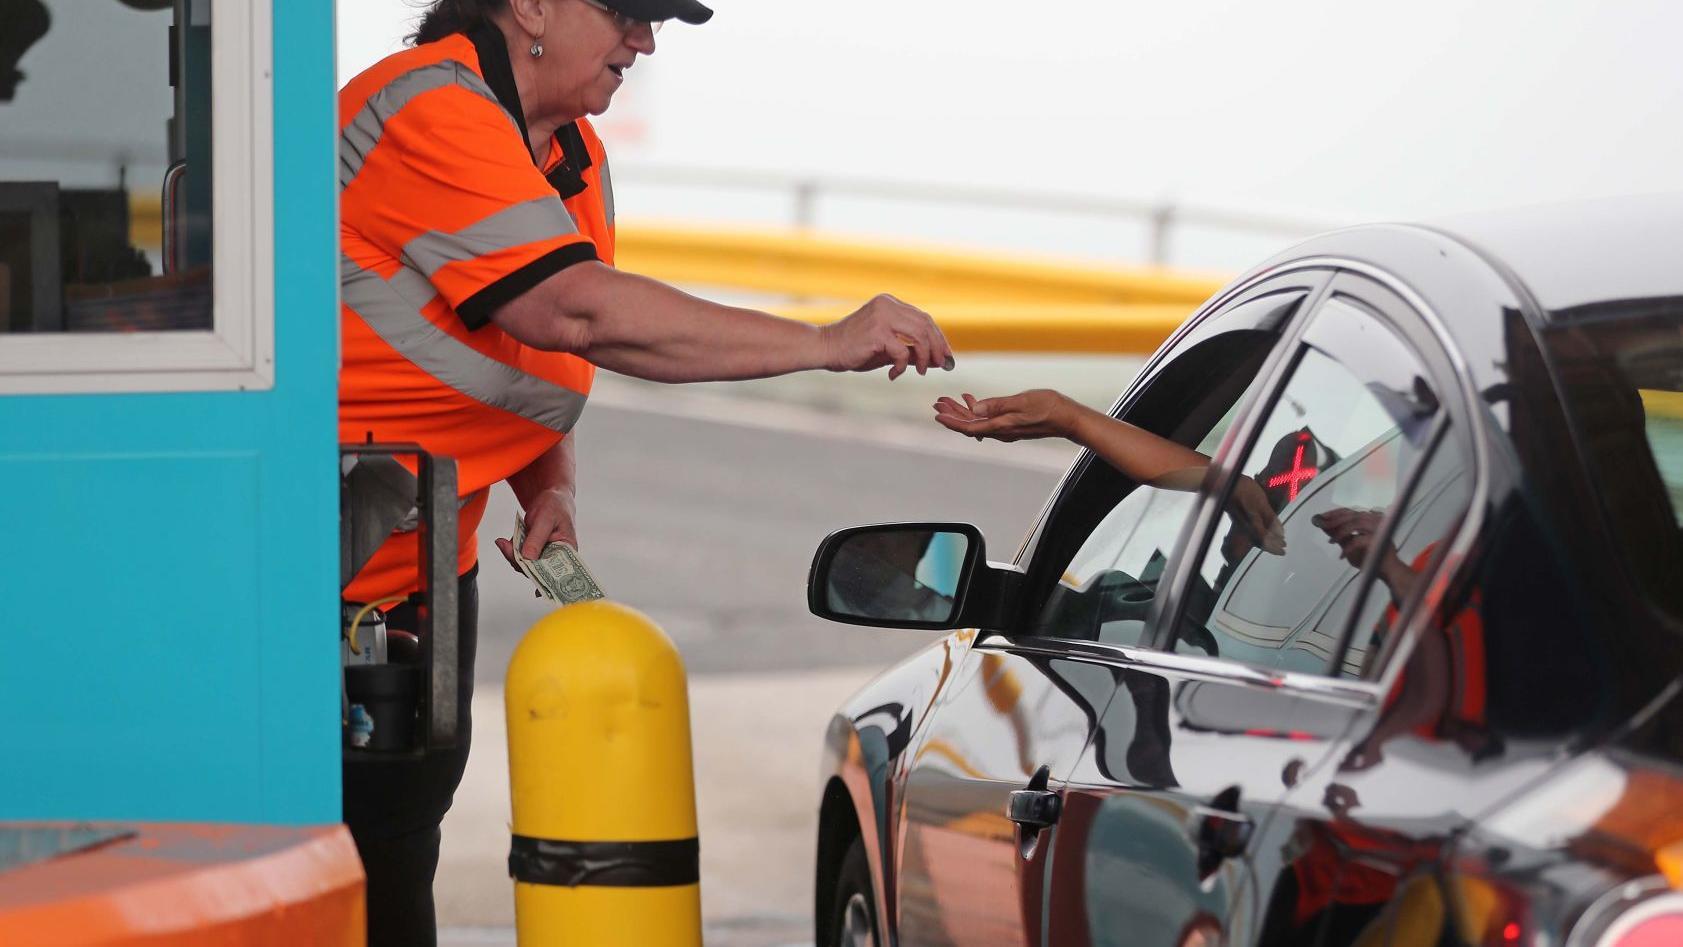 Downbeach Express to raise tolls in June